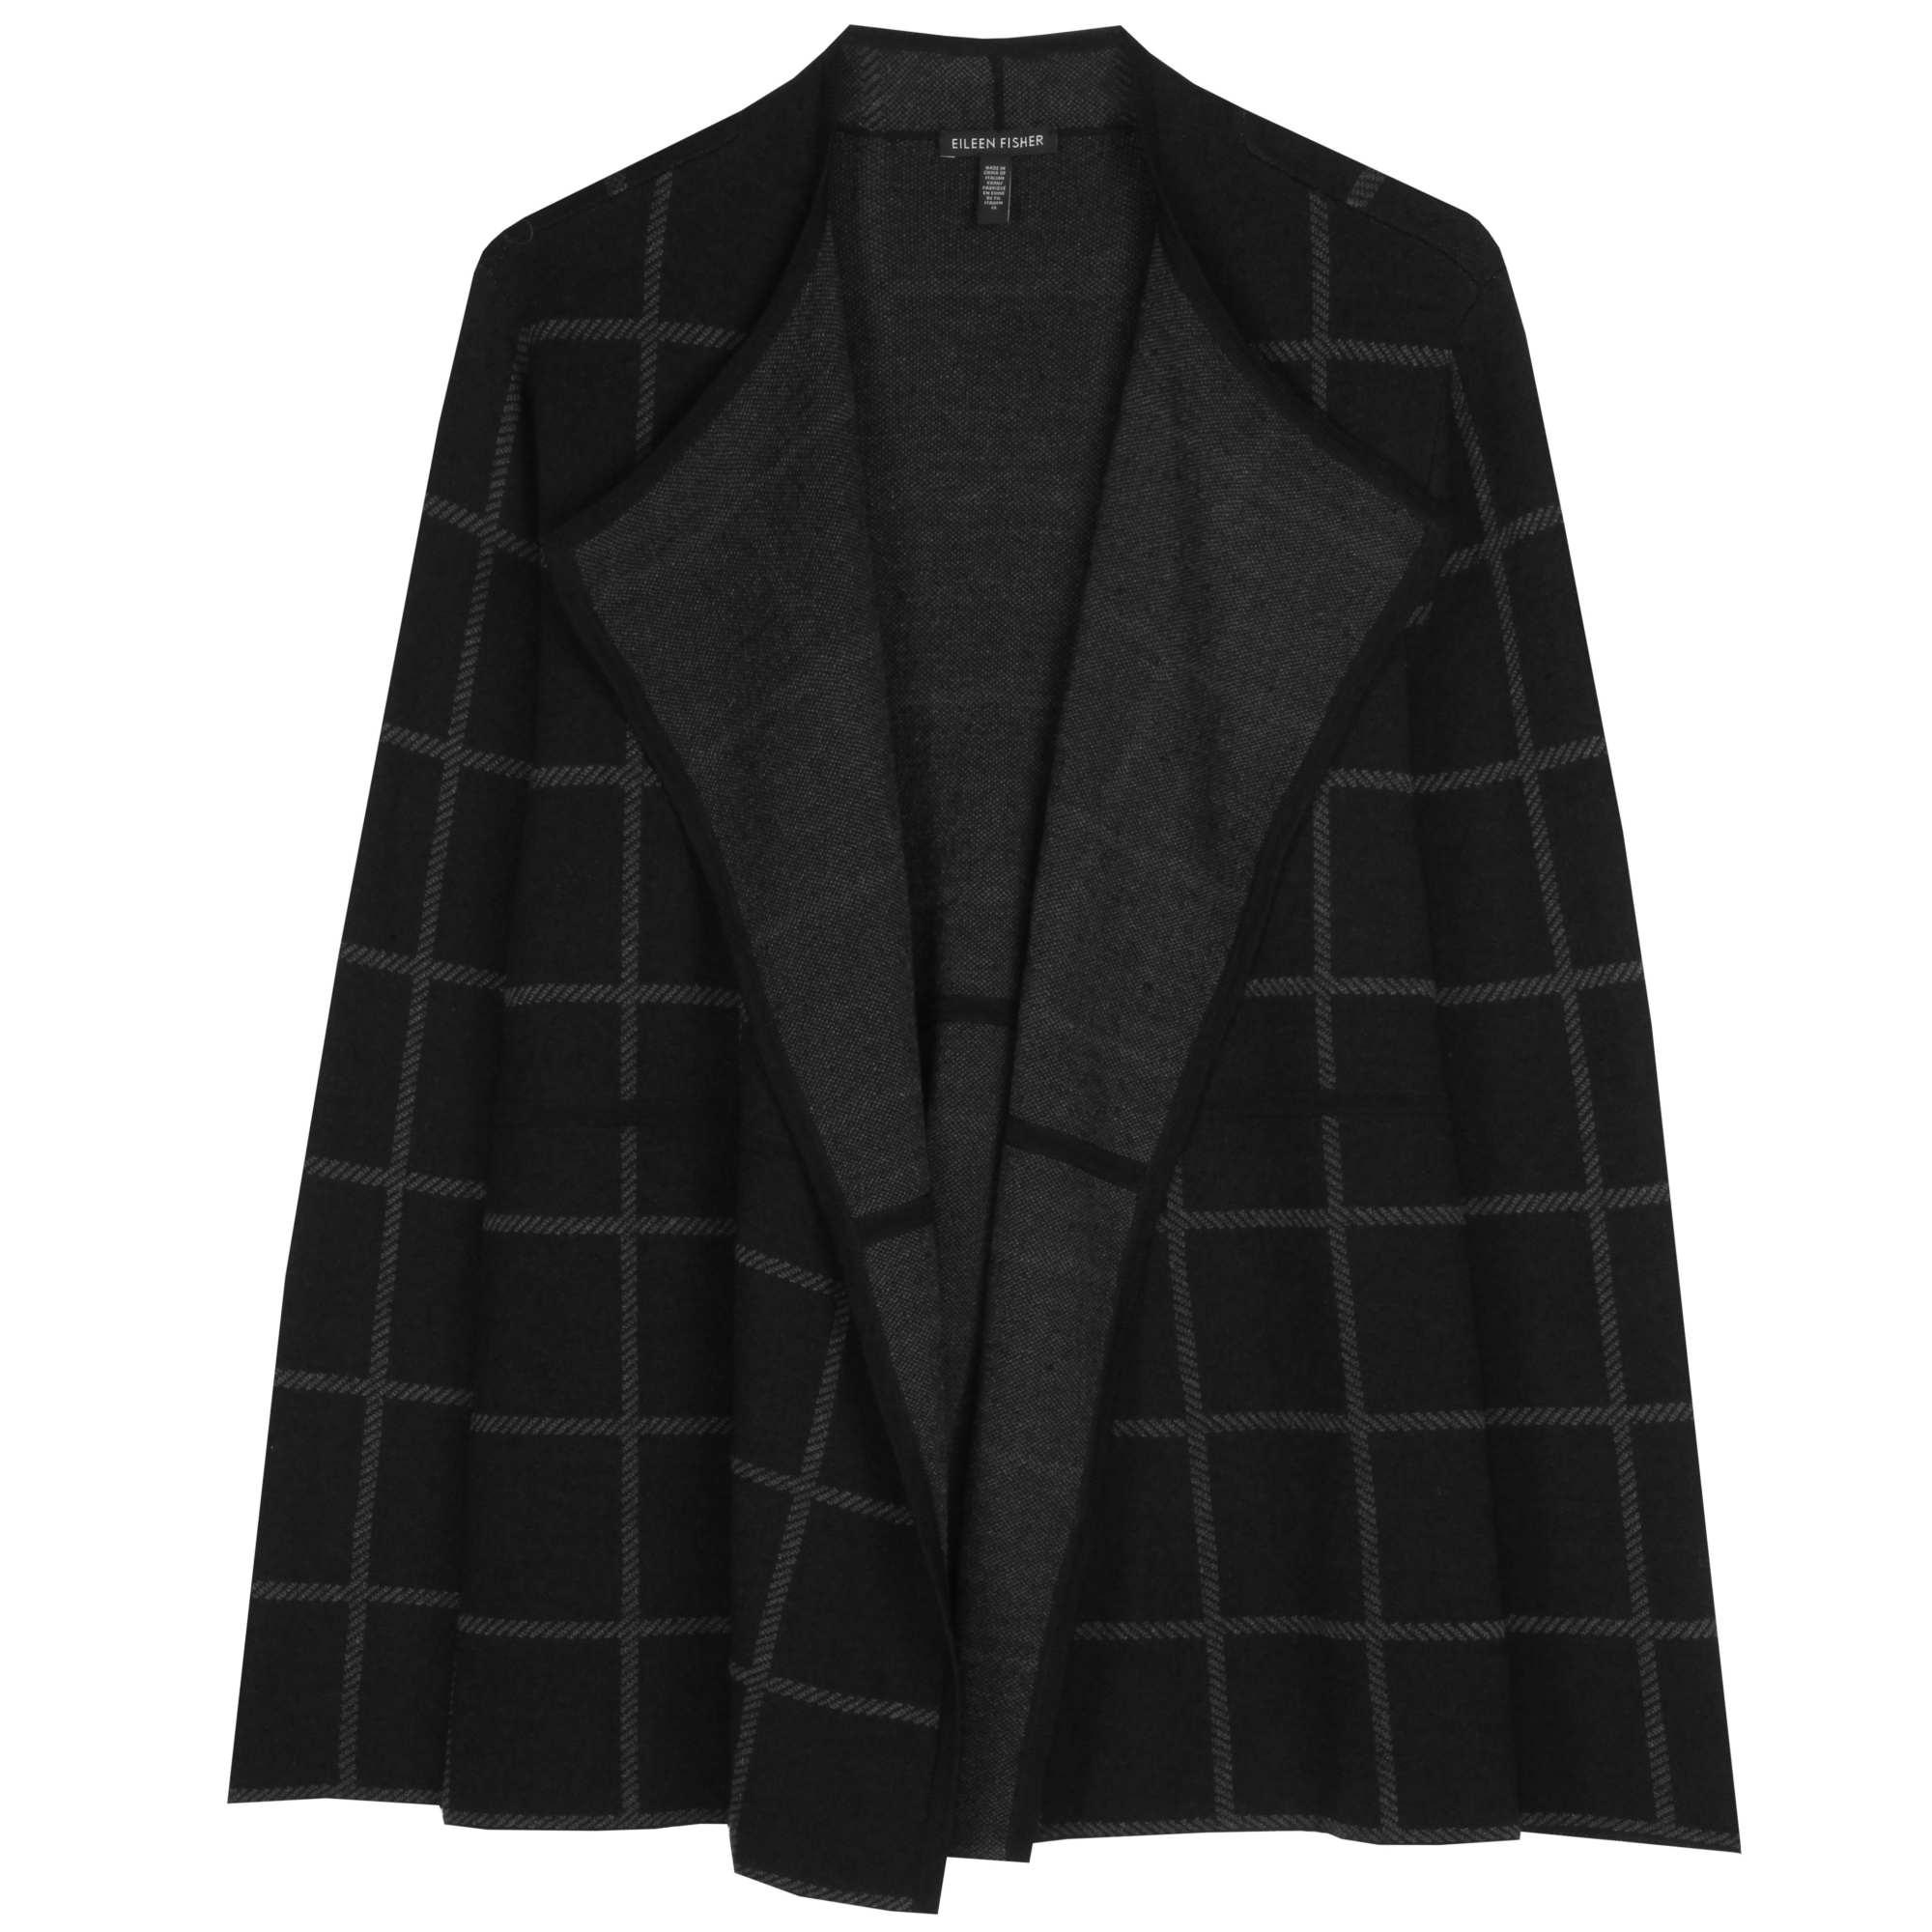 Fine Organic Linen Crepe Jacket